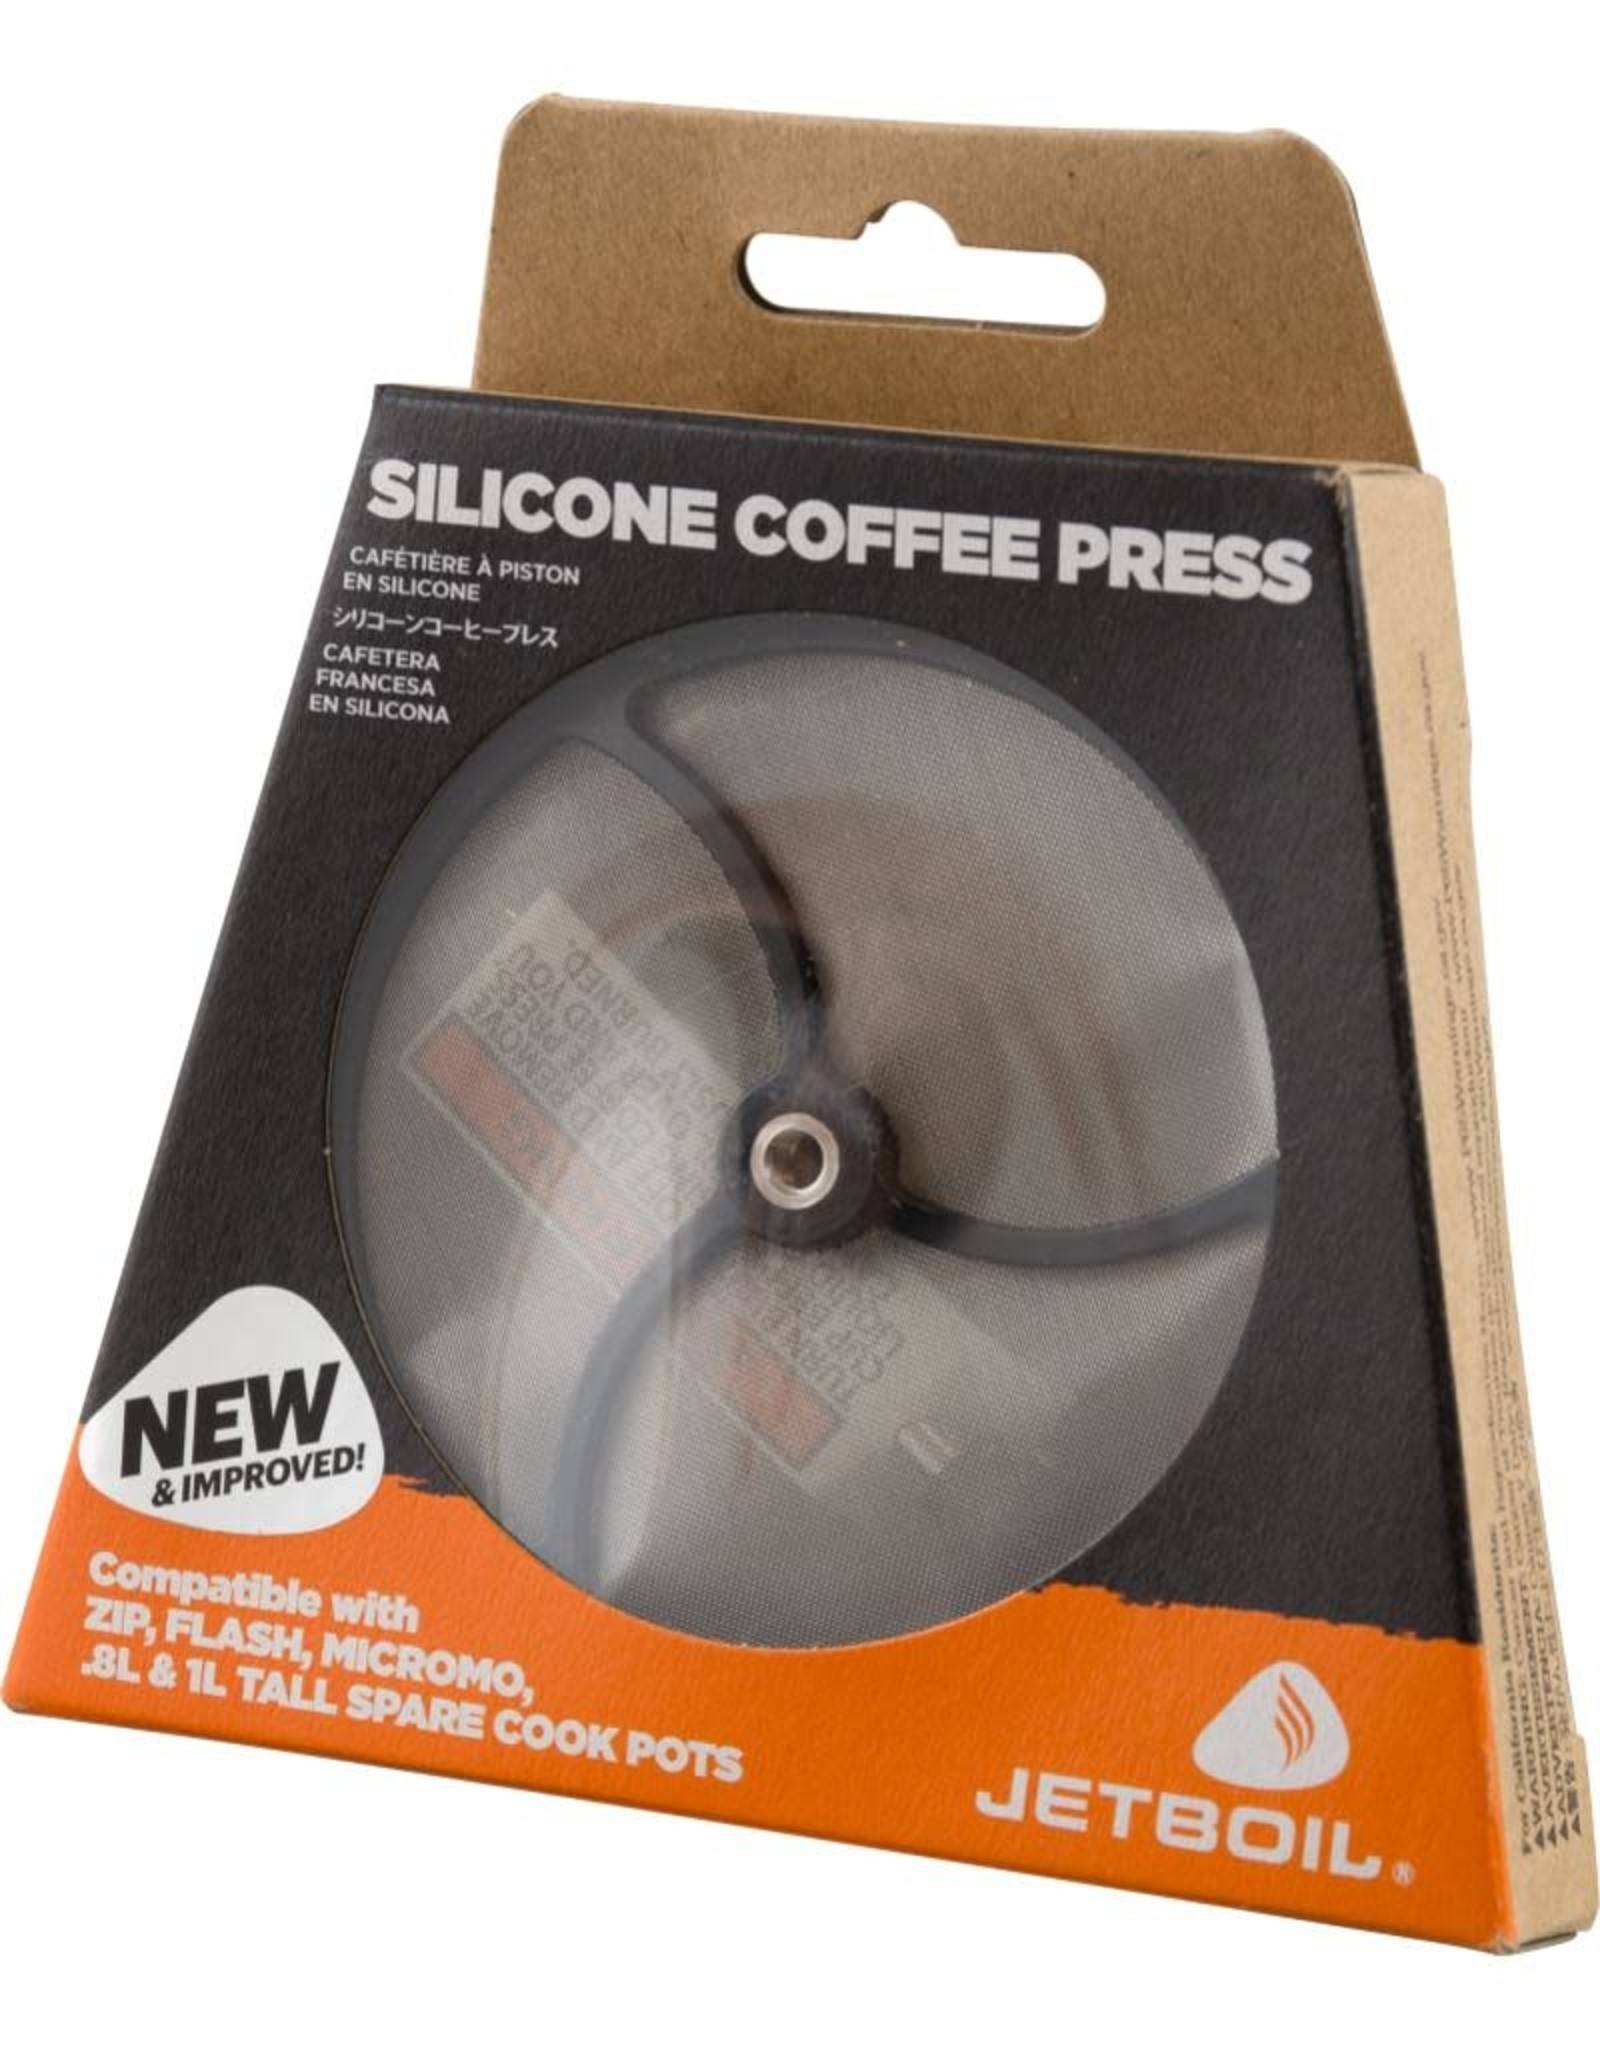 Jetboil Coffee Press